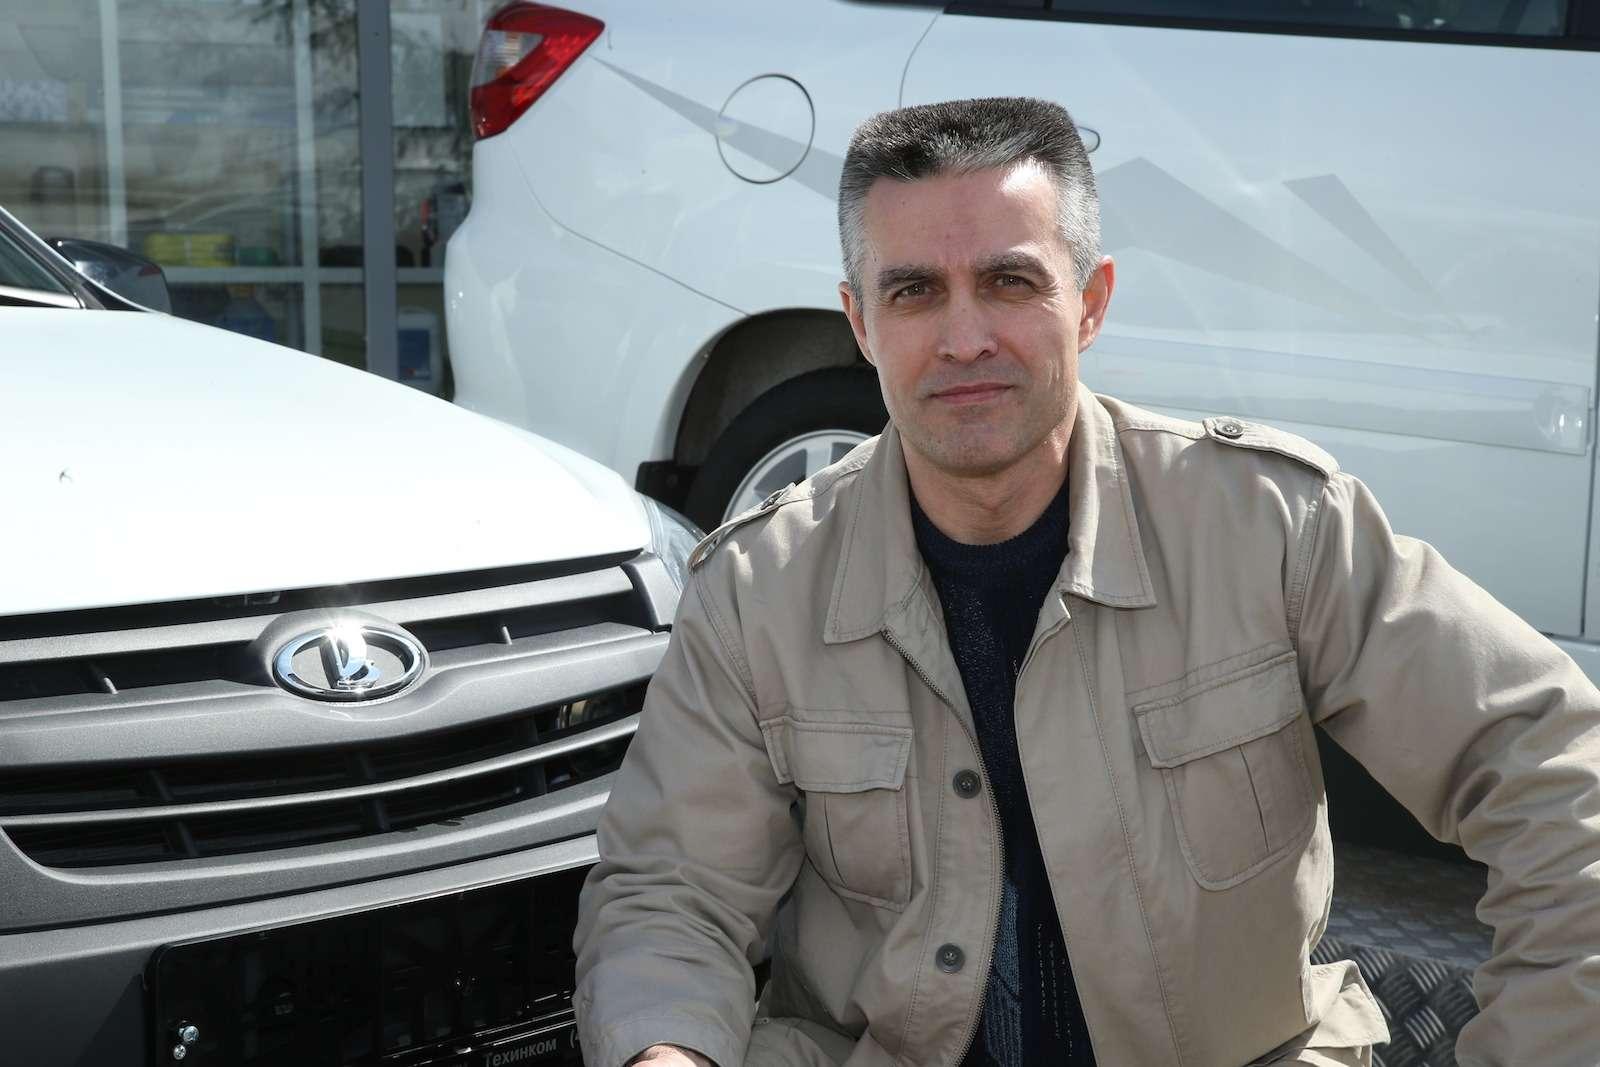 Гран-при «Зарулем»: ключи оттрех Lada Granta переданы победителям— фото 580061